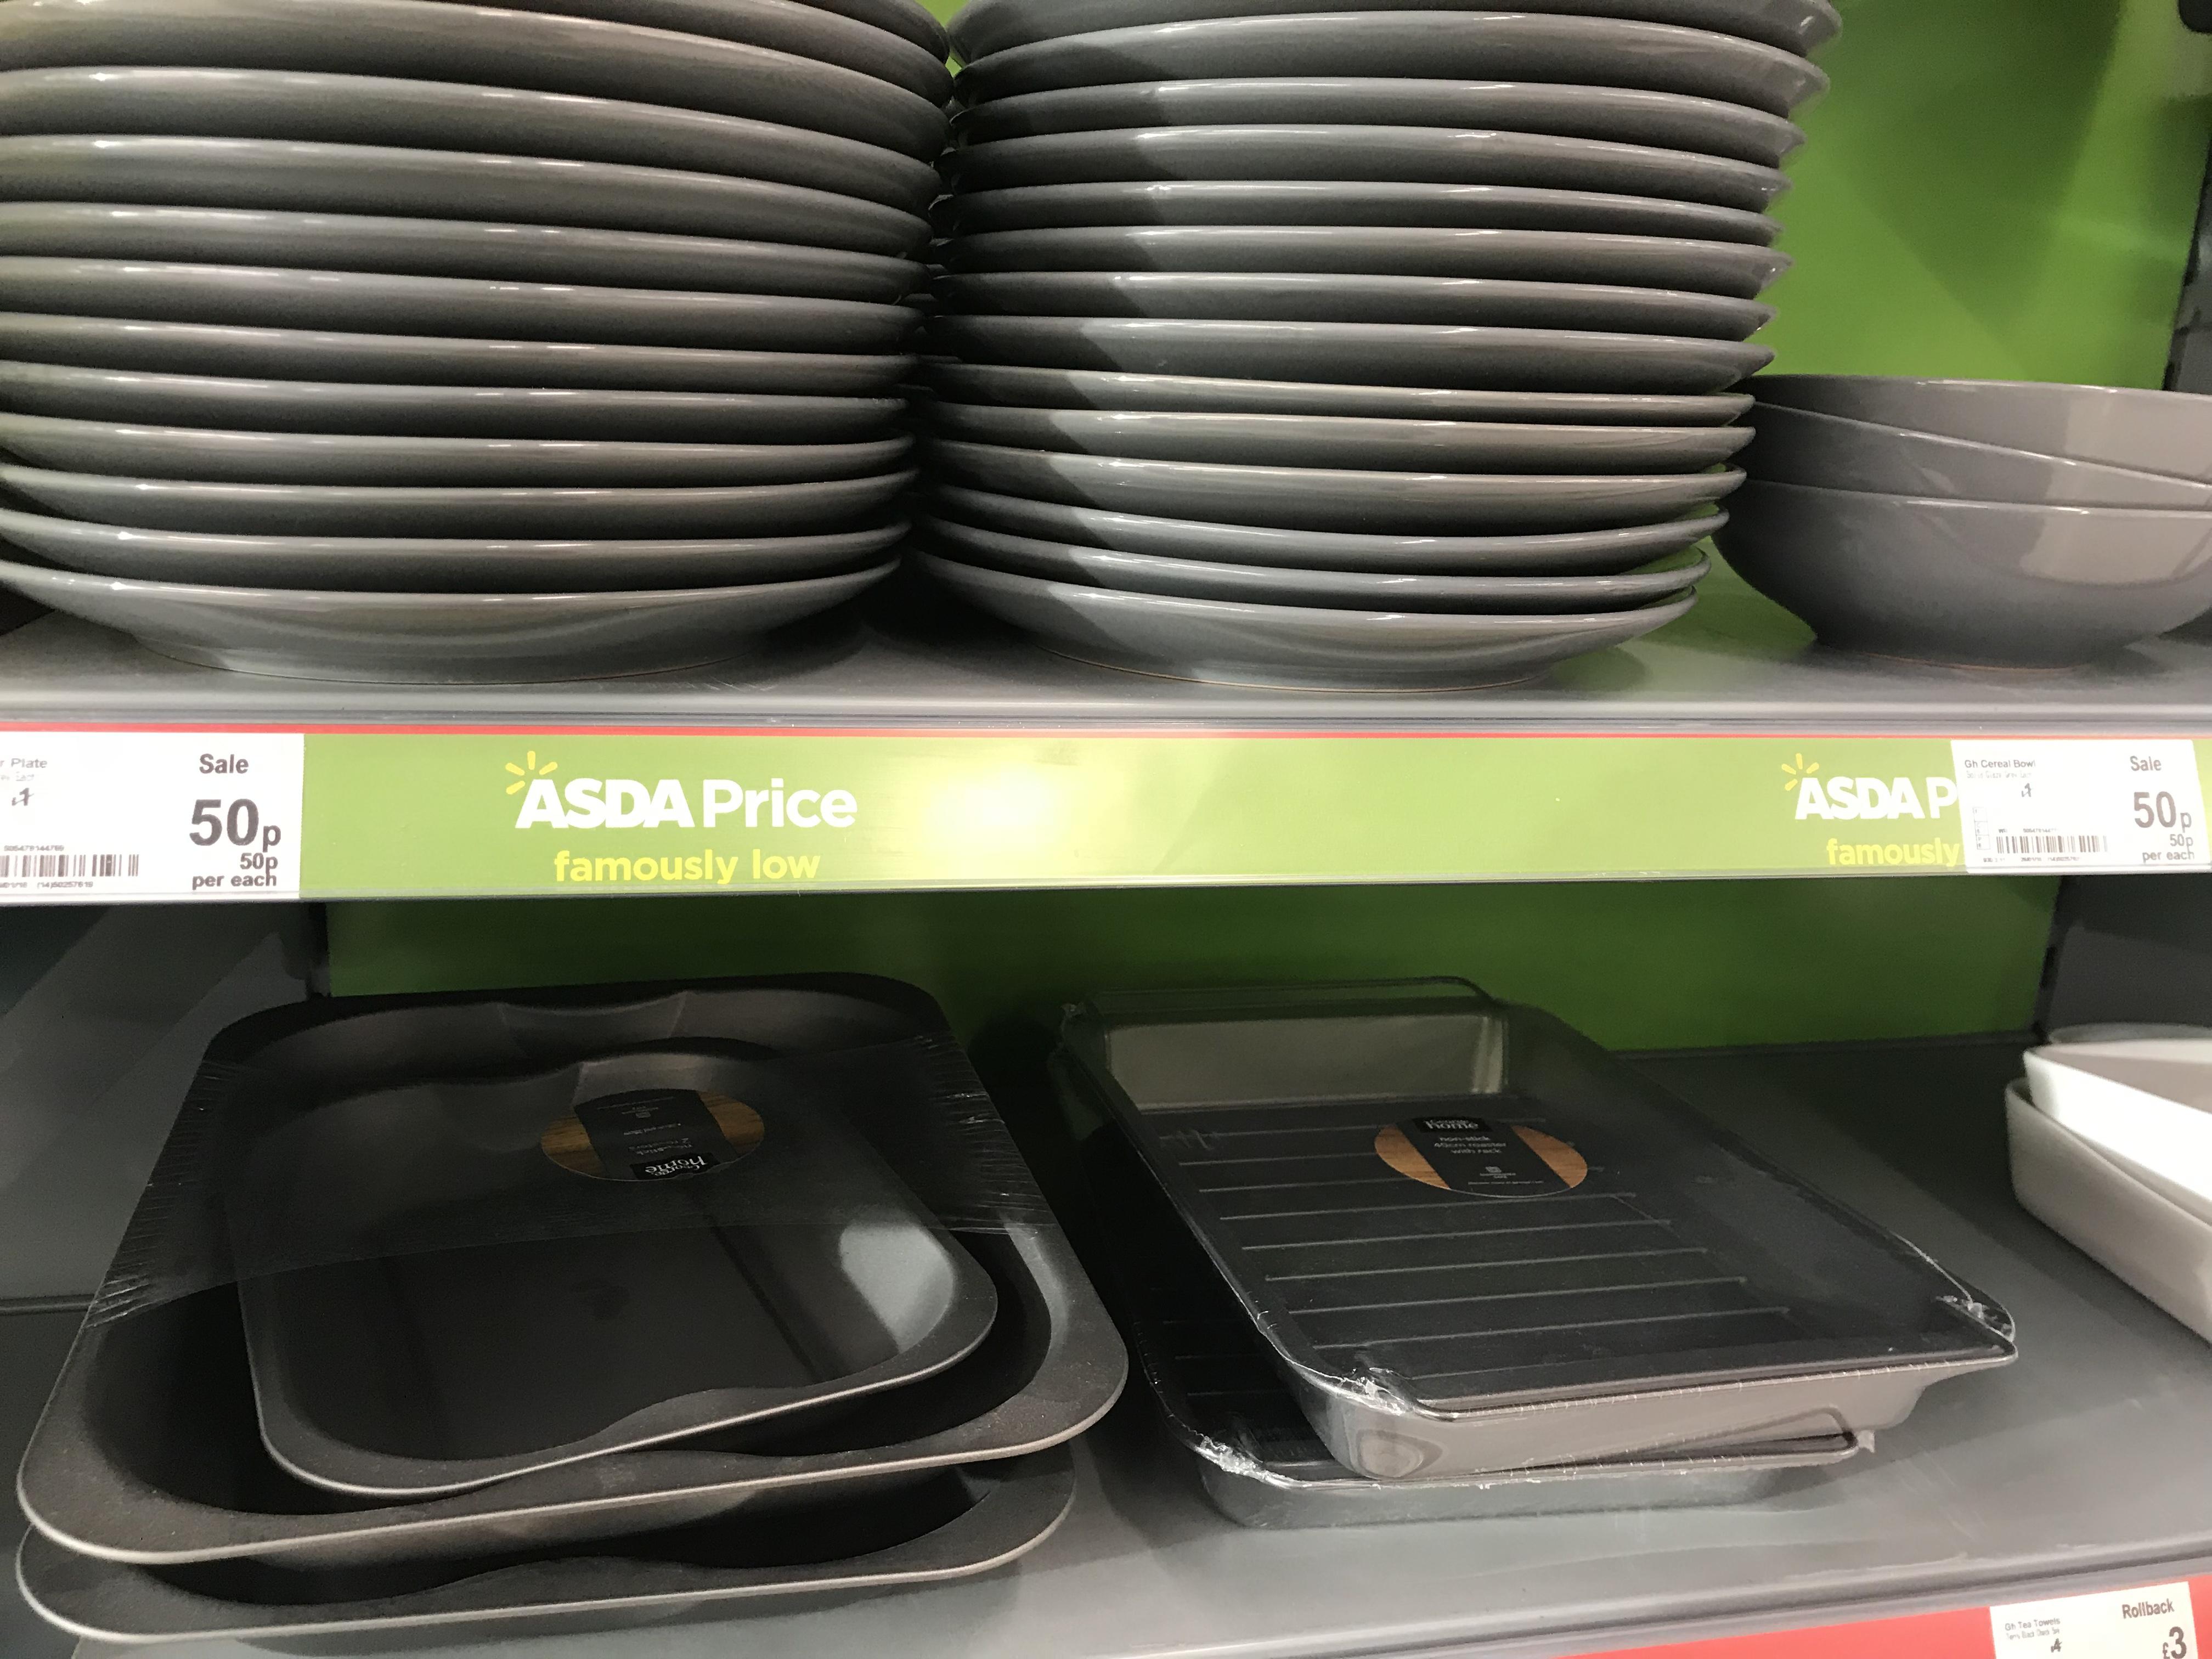 Grey dinner plates & bowls 50p at Asda instore